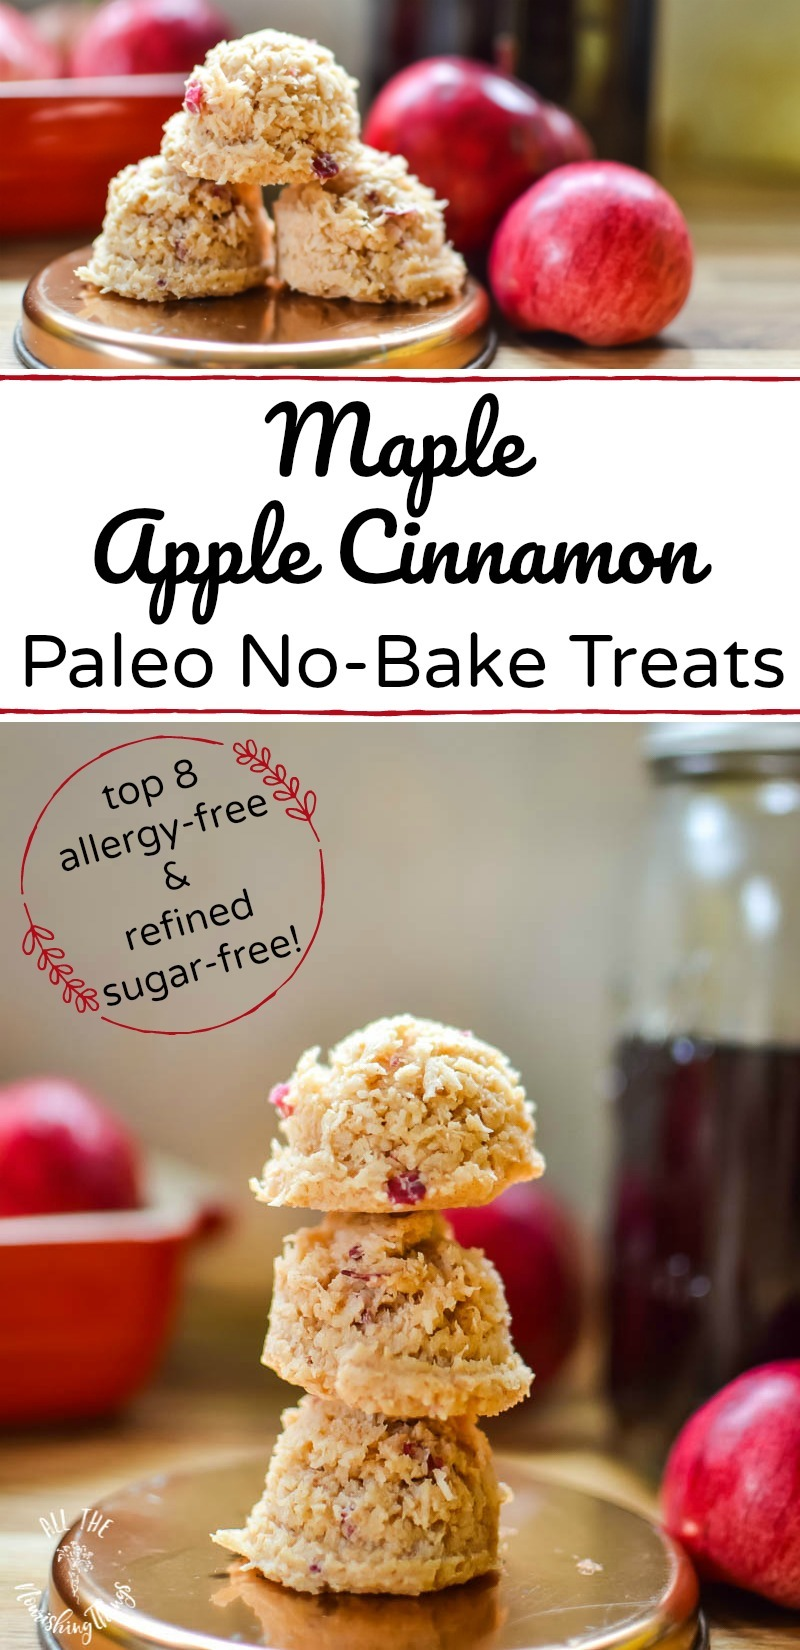 paleo maple apple cinnamon no-bake treats with text overlay